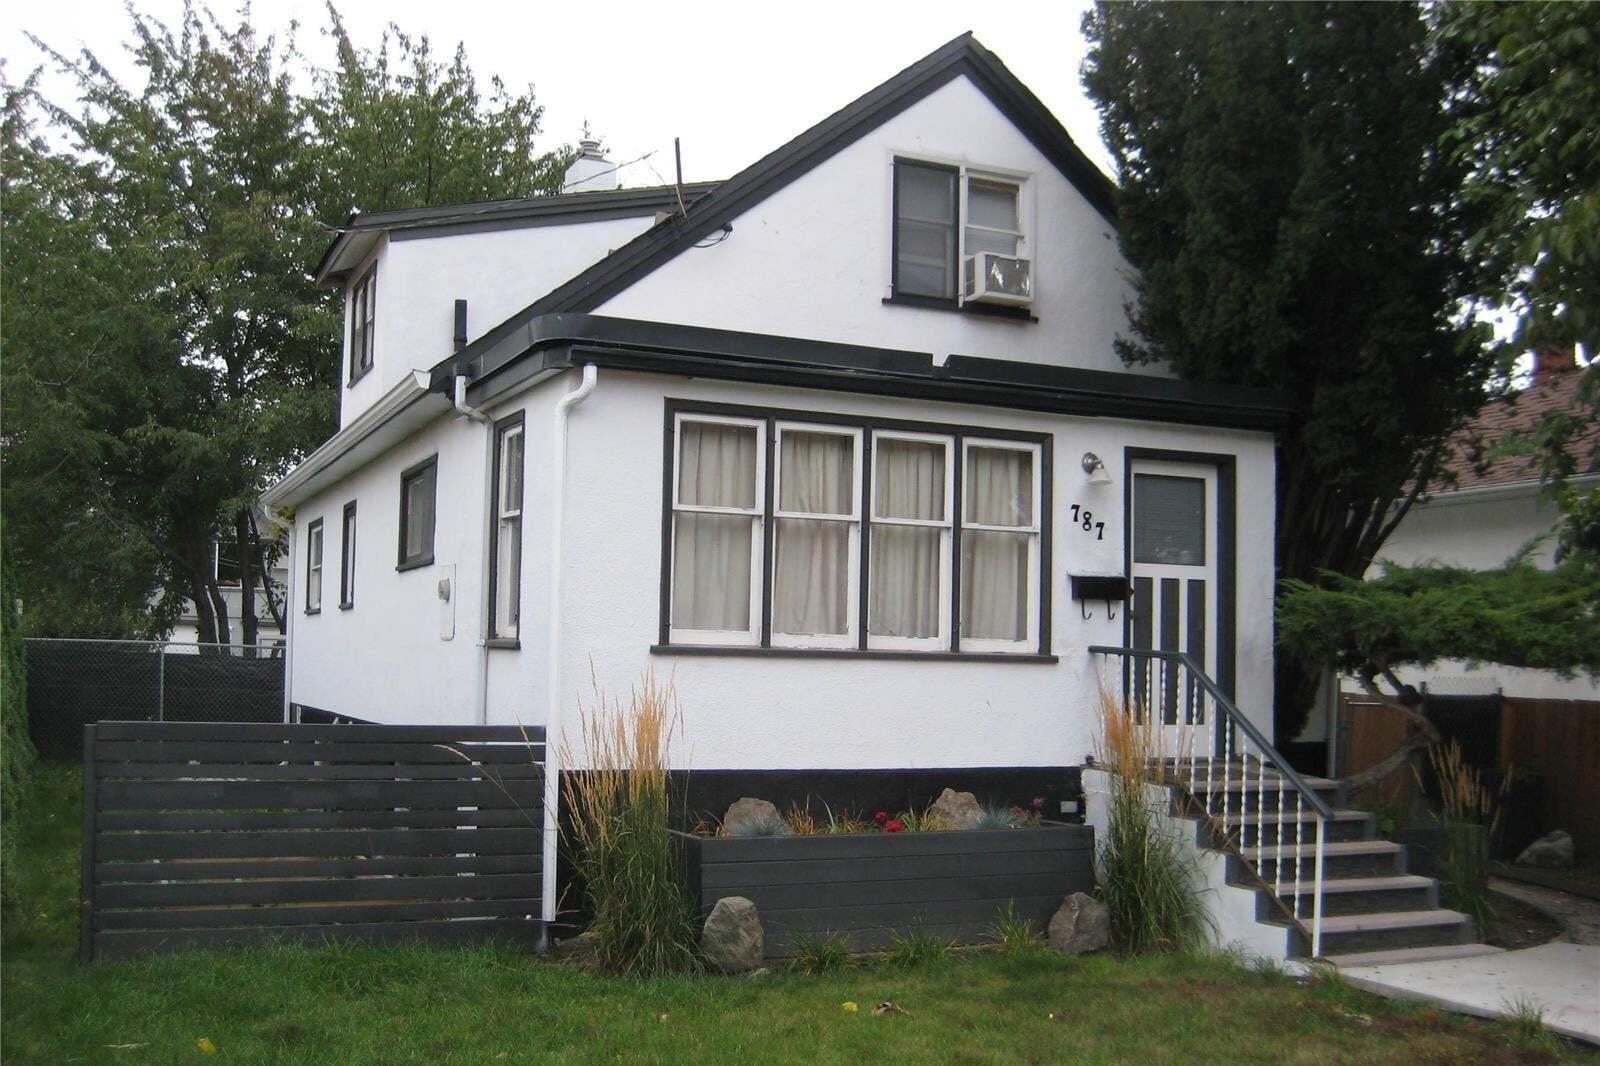 House for sale at 787 Lawson Ave Kelowna, B.c. British Columbia - MLS: 10217600